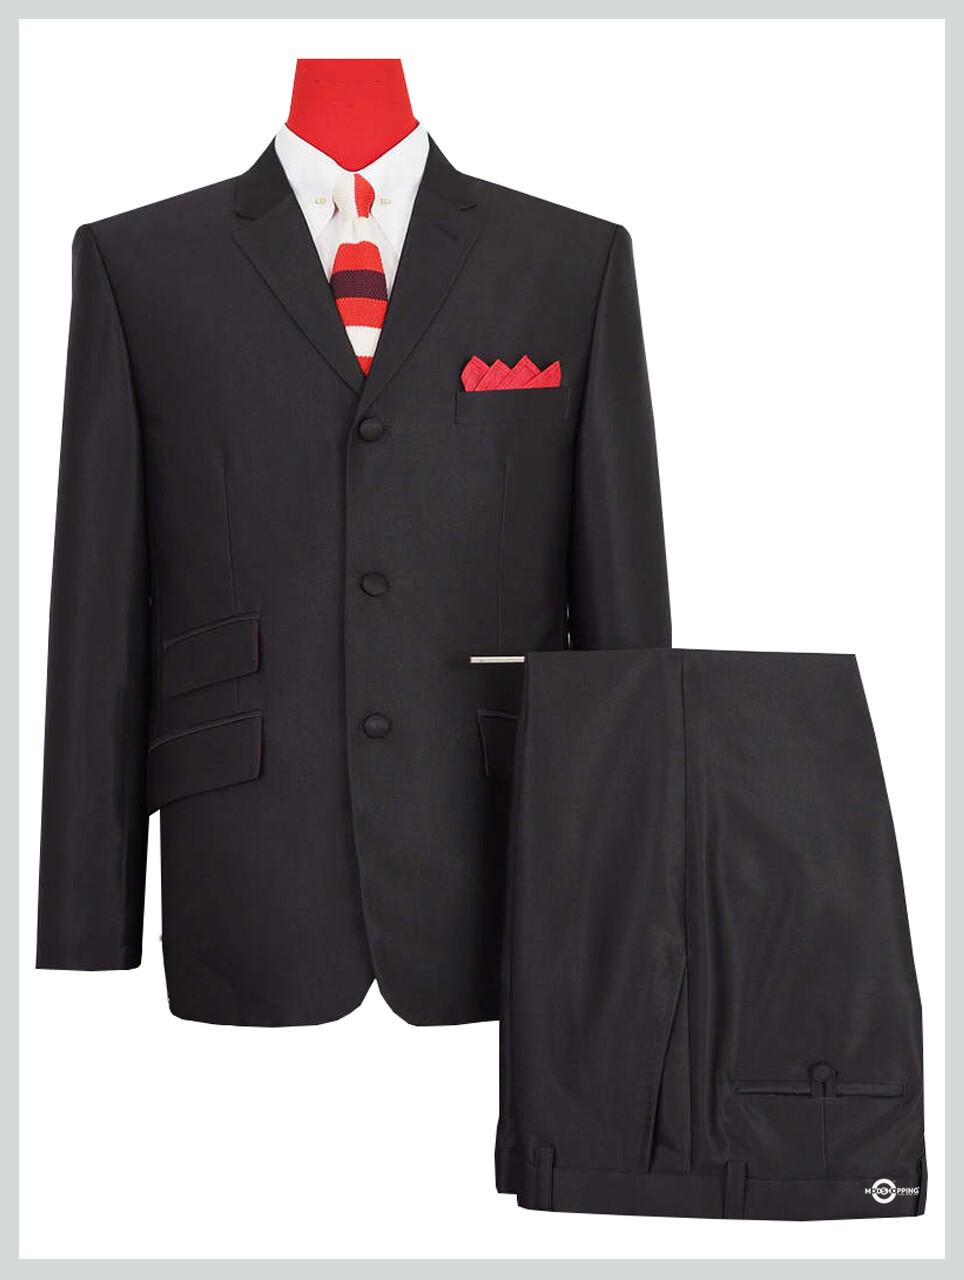 tonic suit  essential tailored classic black mod tonic suit for men